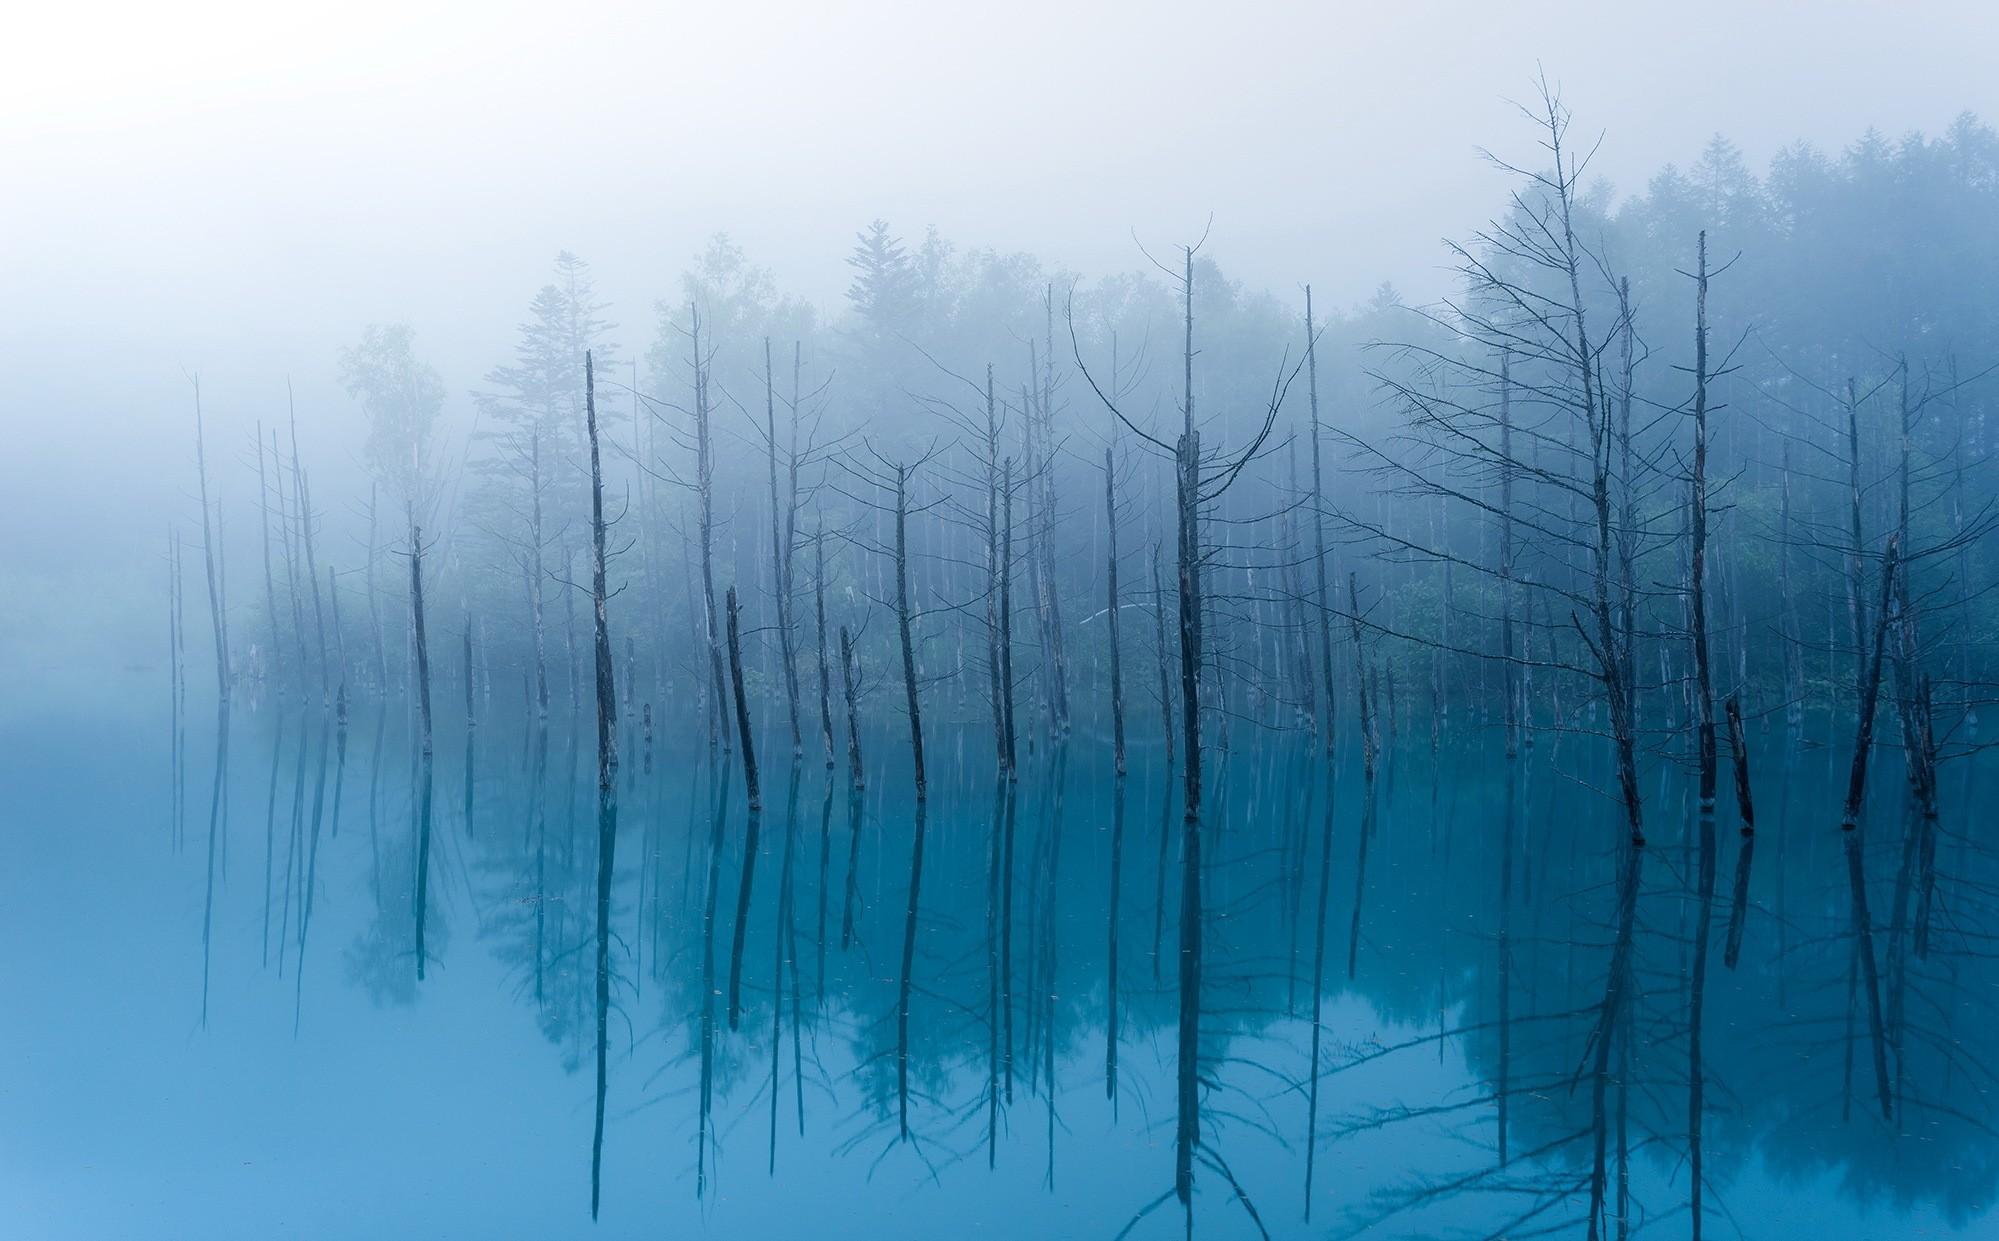 General 1999x1241 water dead trees mist reflection blue cyan trees lake calm waters